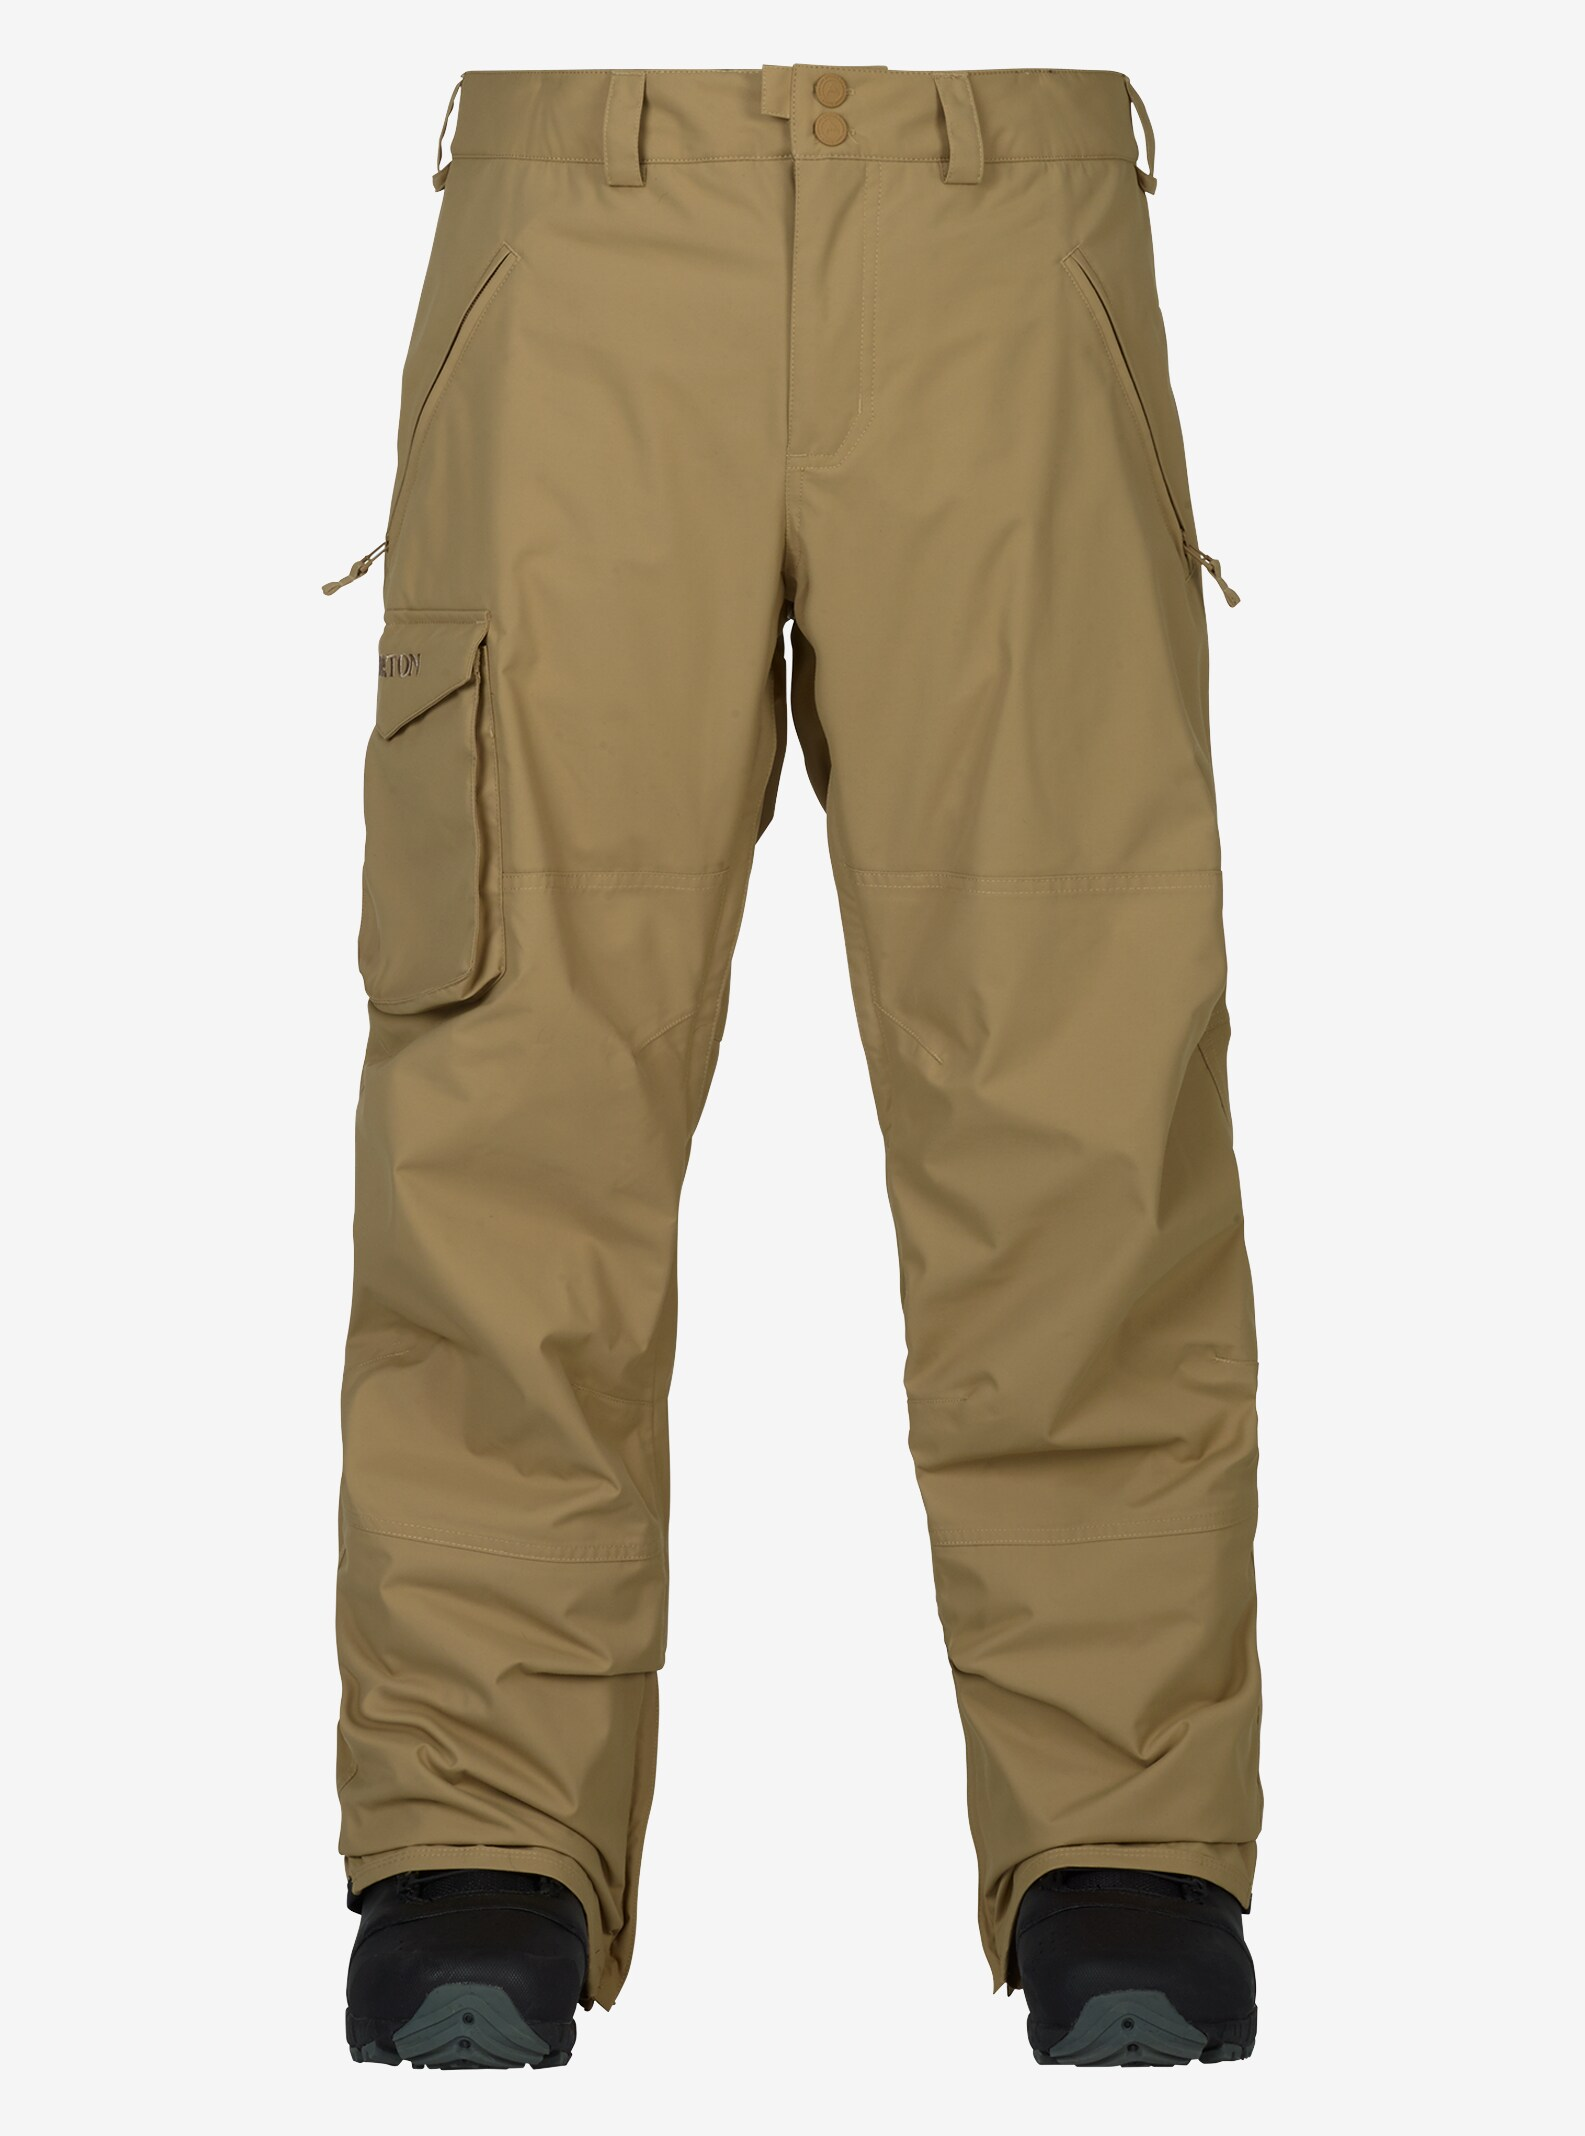 Men's Burton Covert Pant shown in Kelp